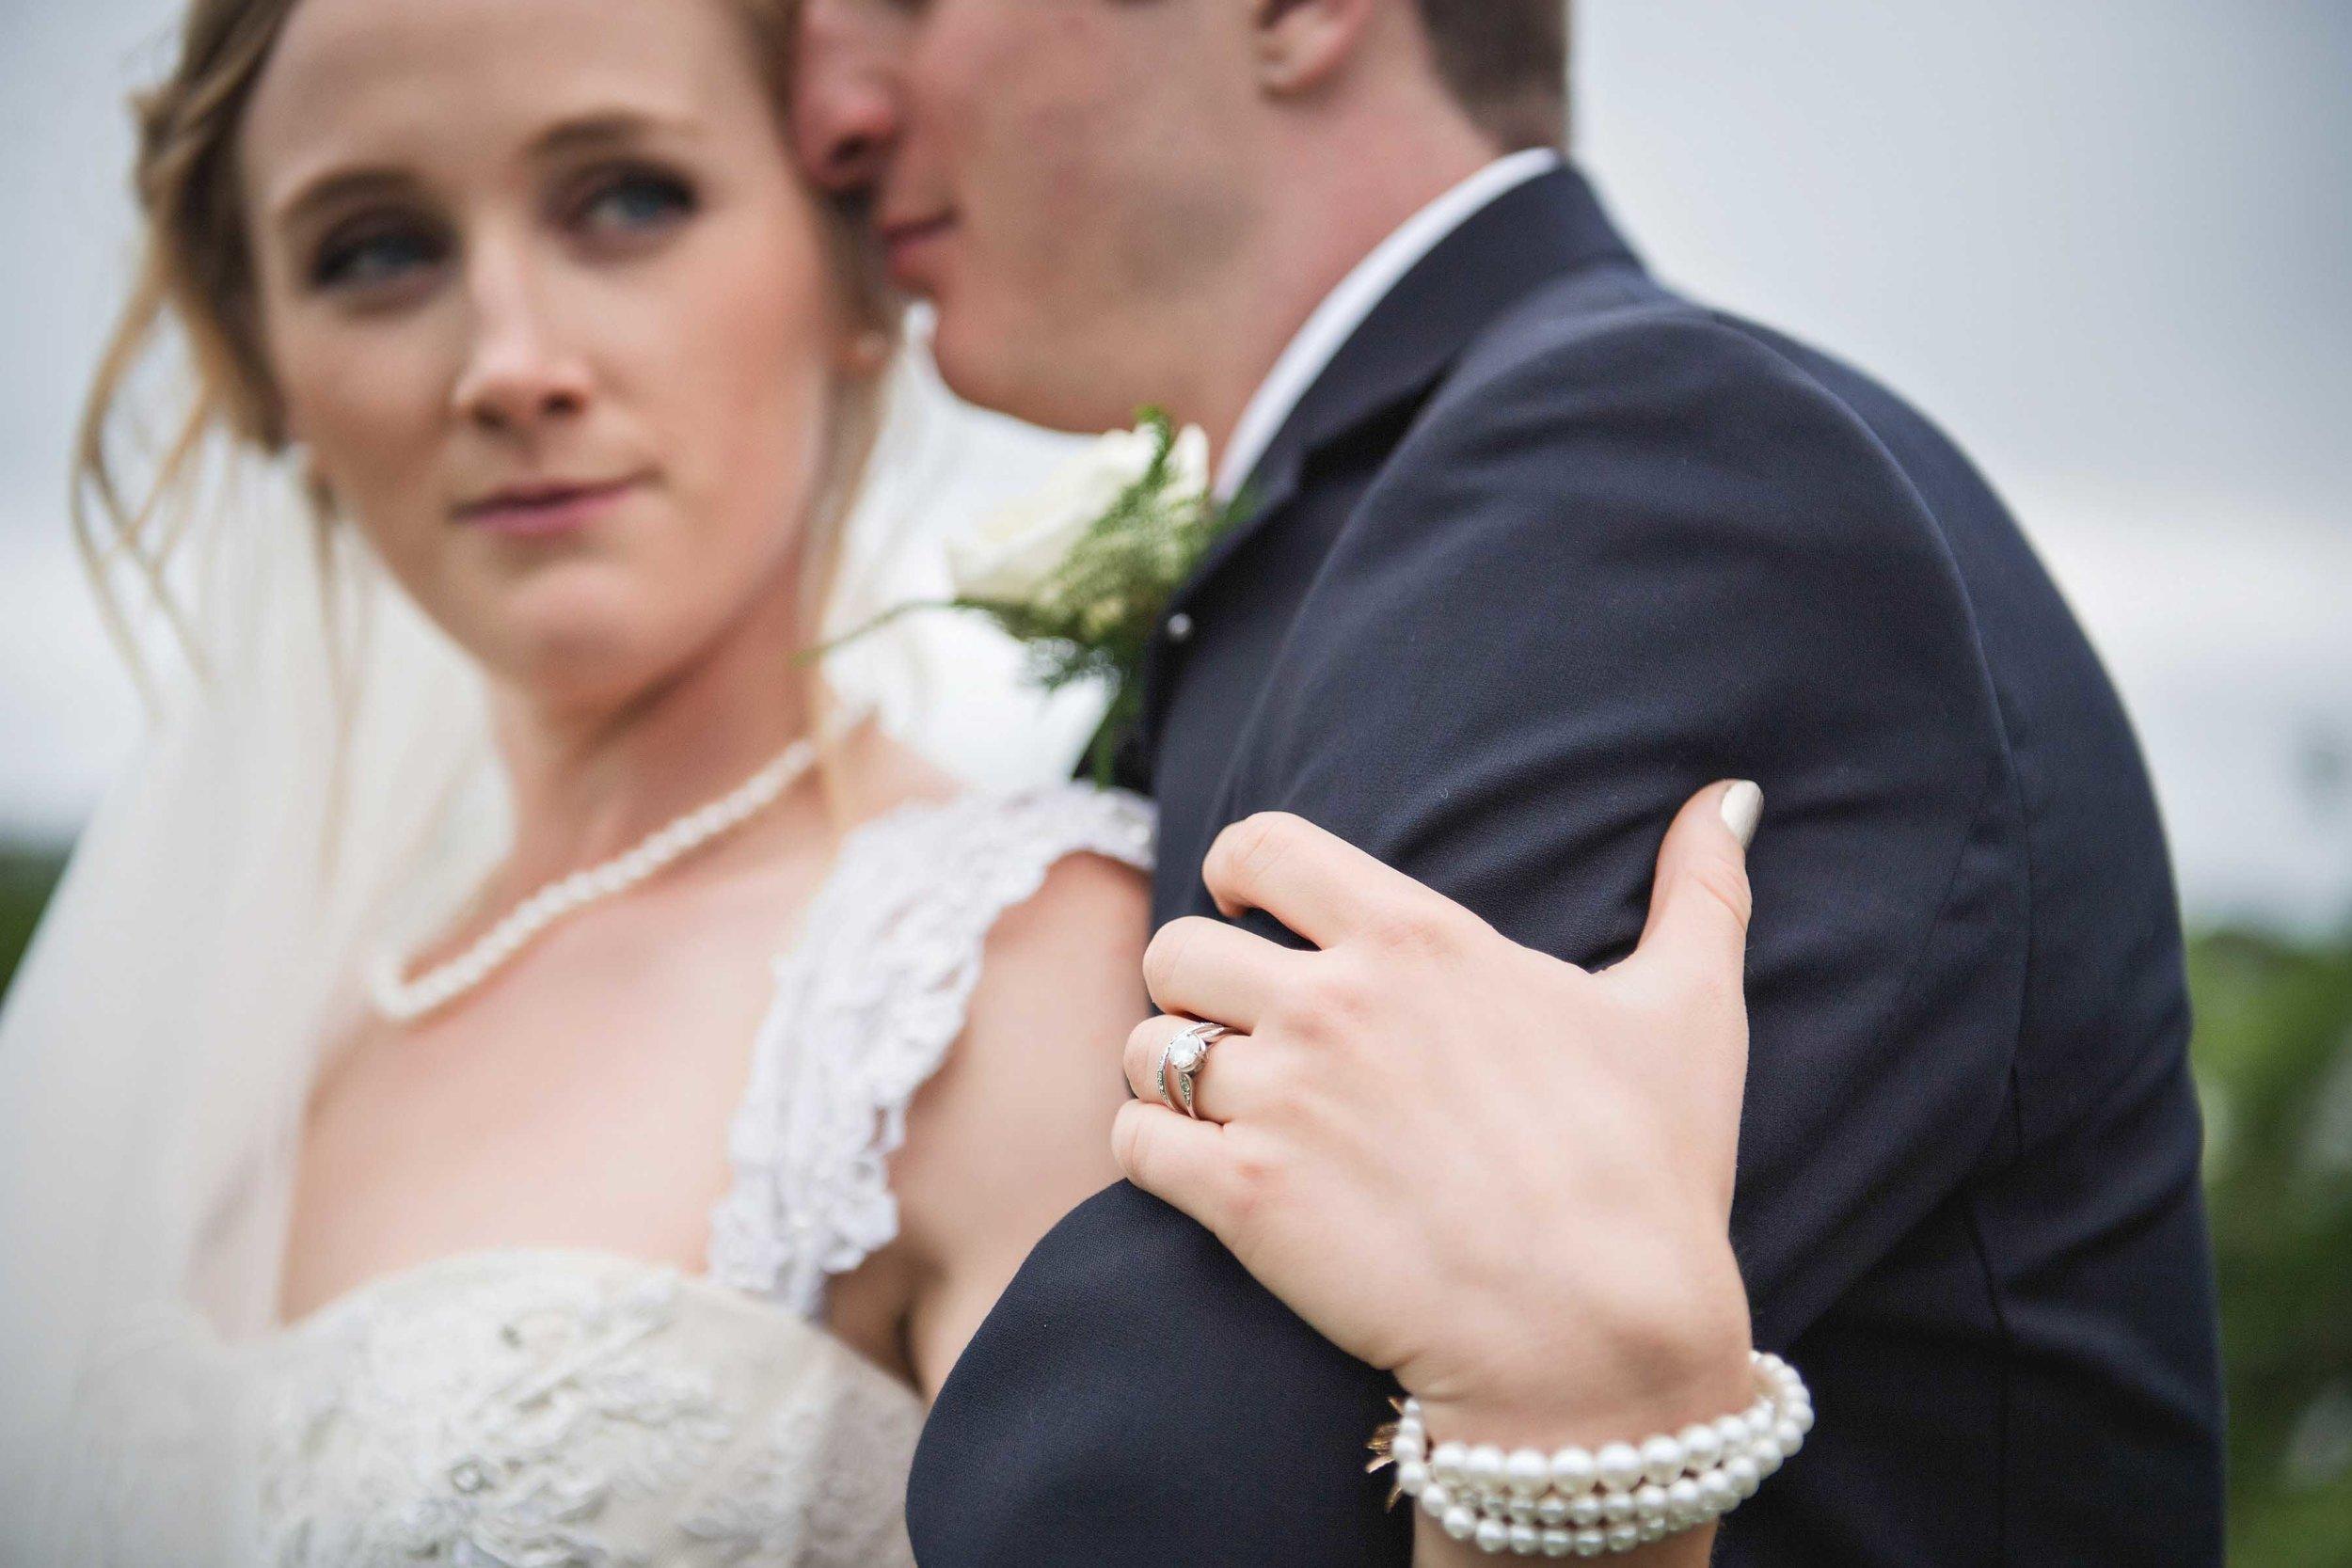 Obici House Wedding Photograph - Suffolk Virginia - Rebekah And Spencer - by John Cachero for Ross Costanza Photography